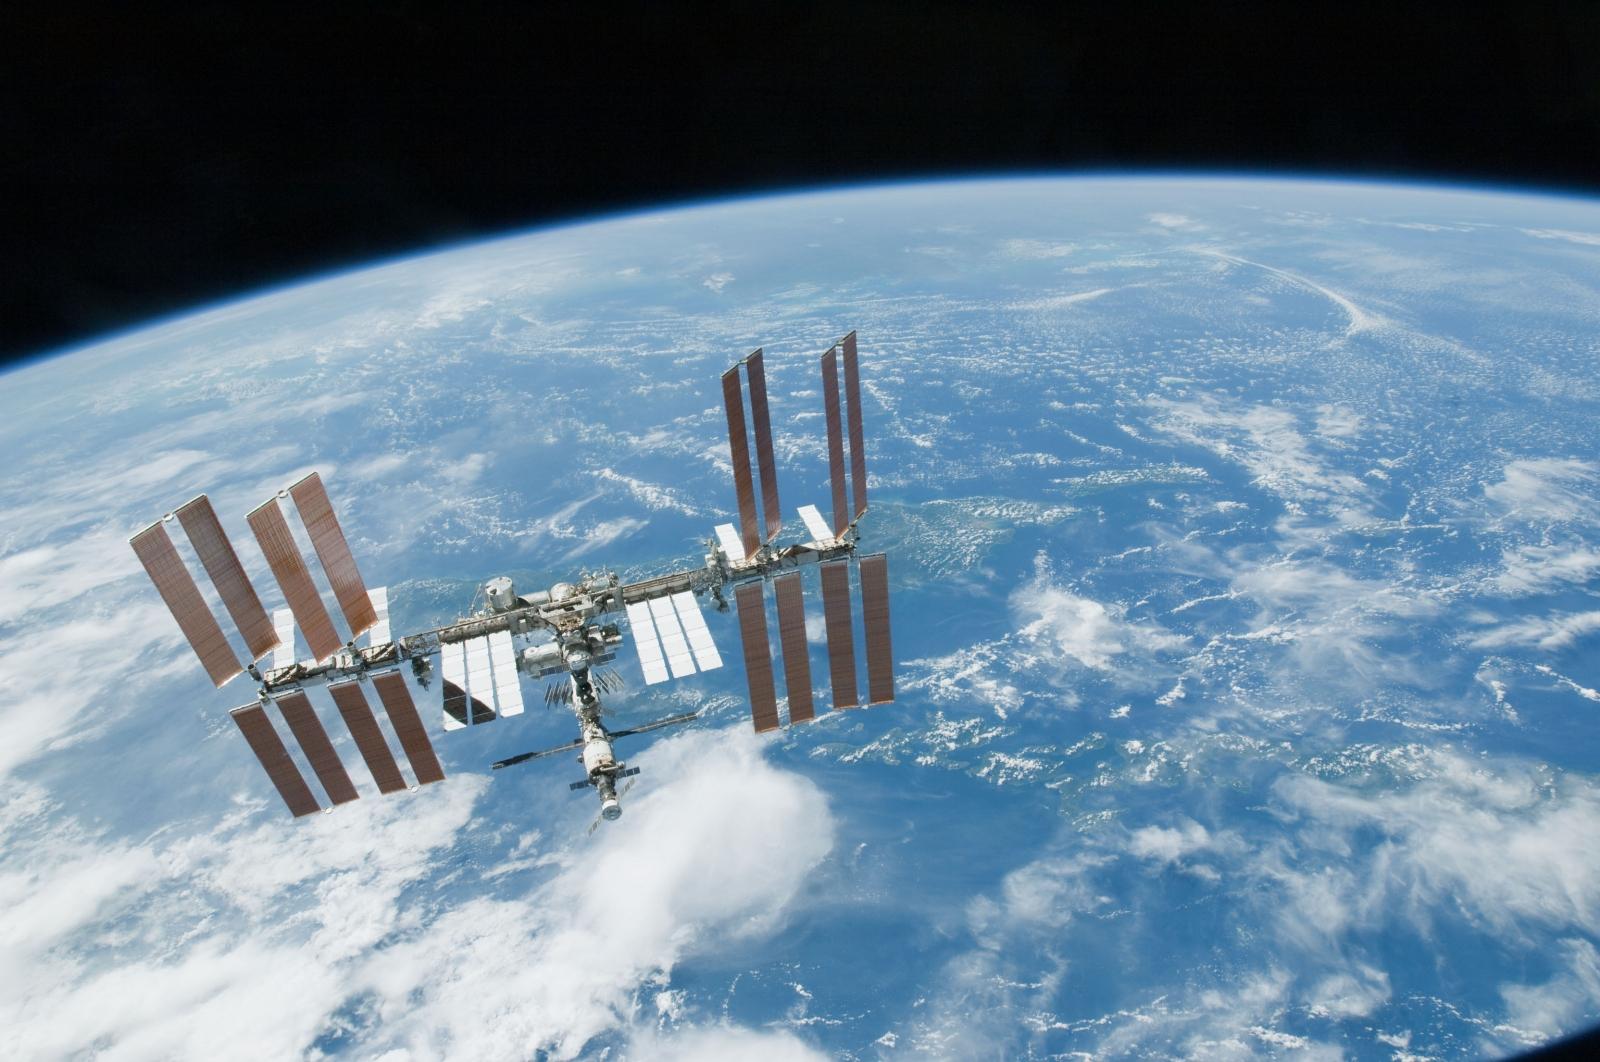 Telerobotic handshake received from International Space Station